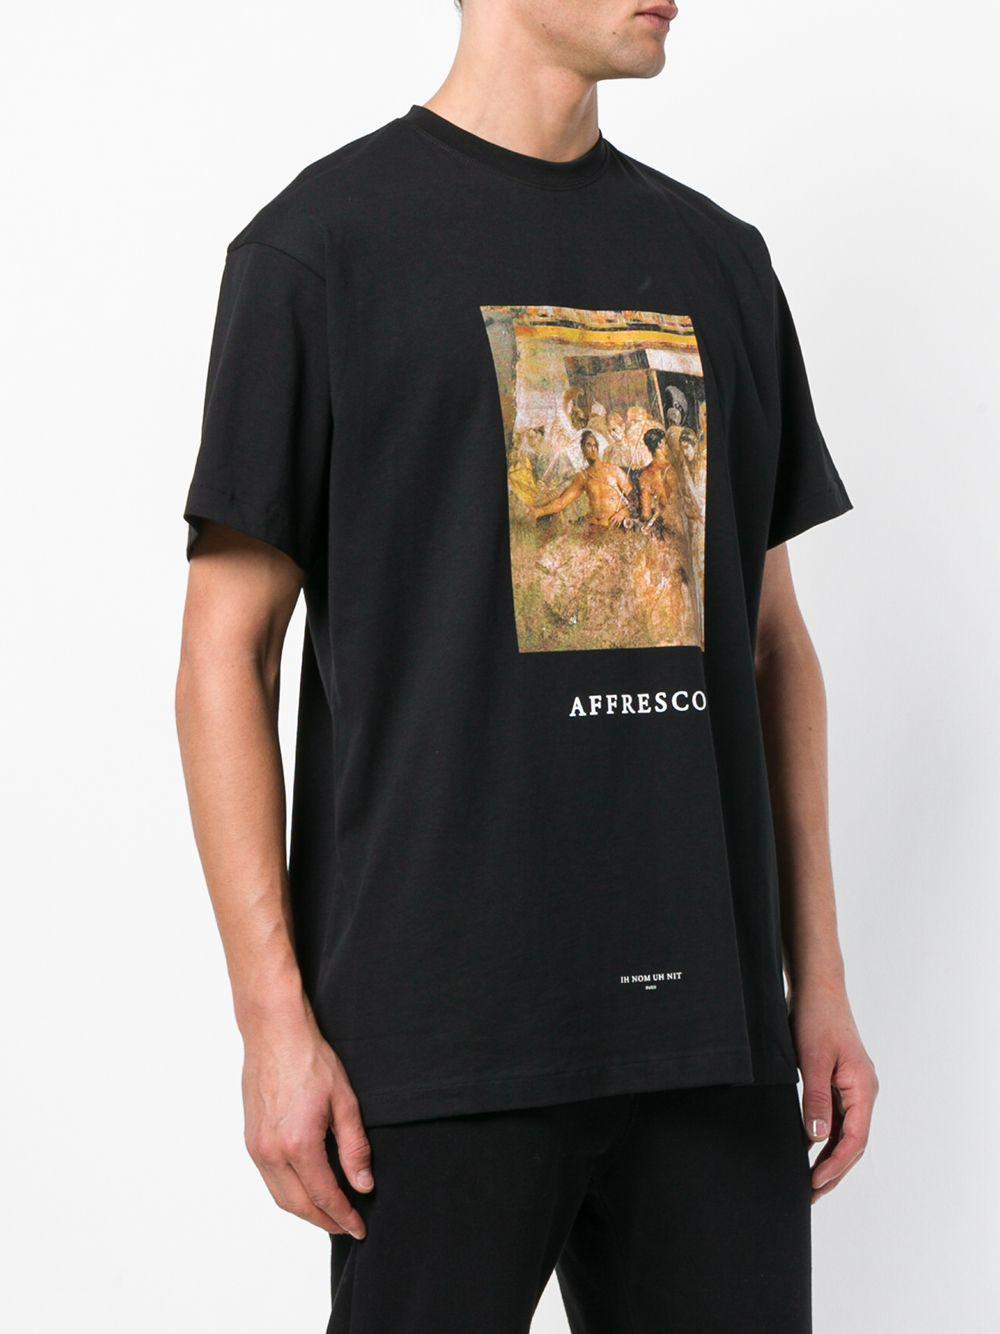 Lyst ih nom uh nit Alfresco T shirt in Black for Men